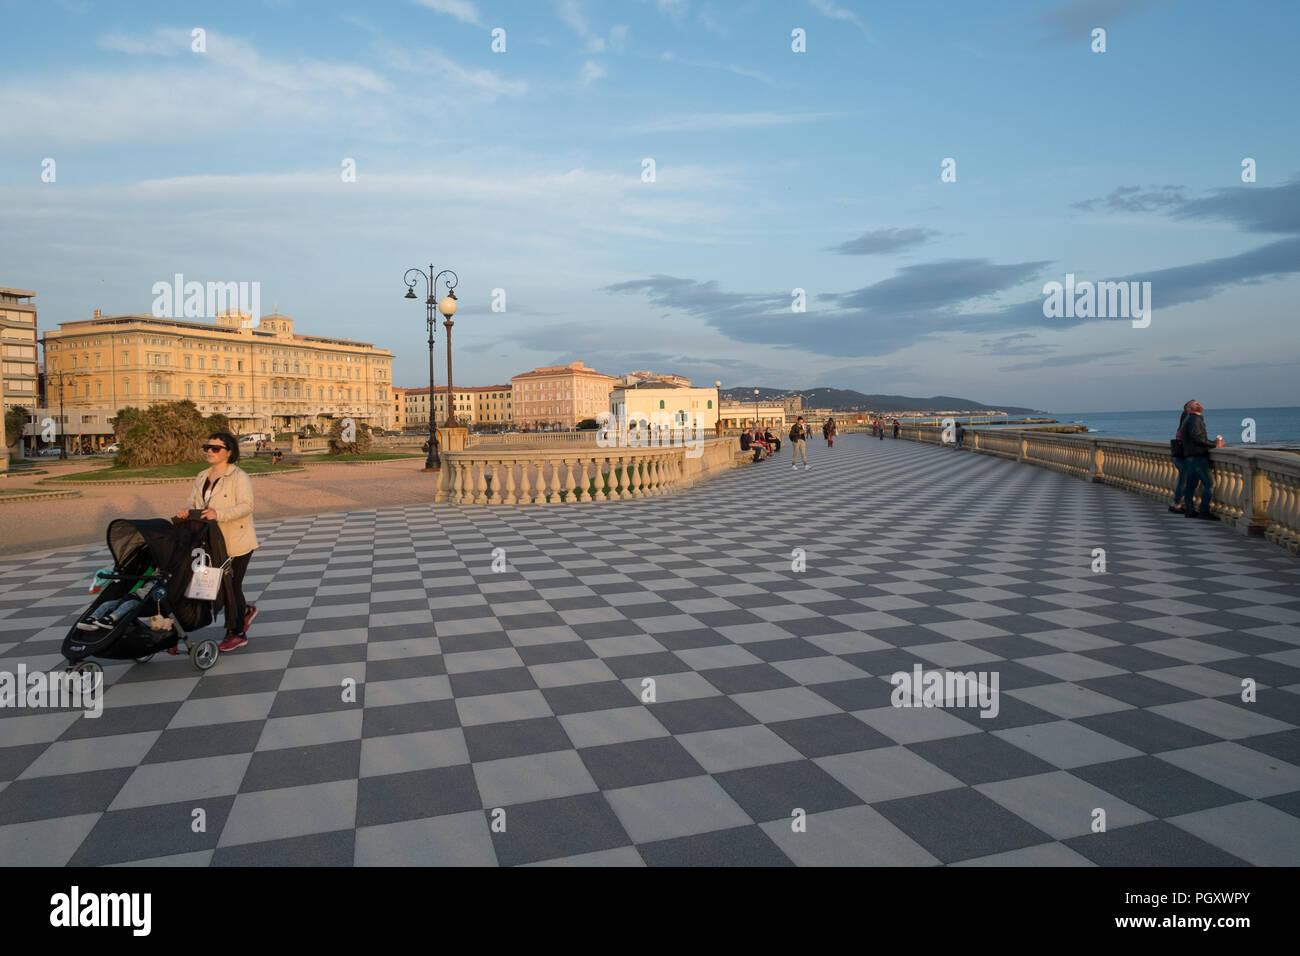 Terrazza Mascagni A Promenade And Park Area On The Seafront